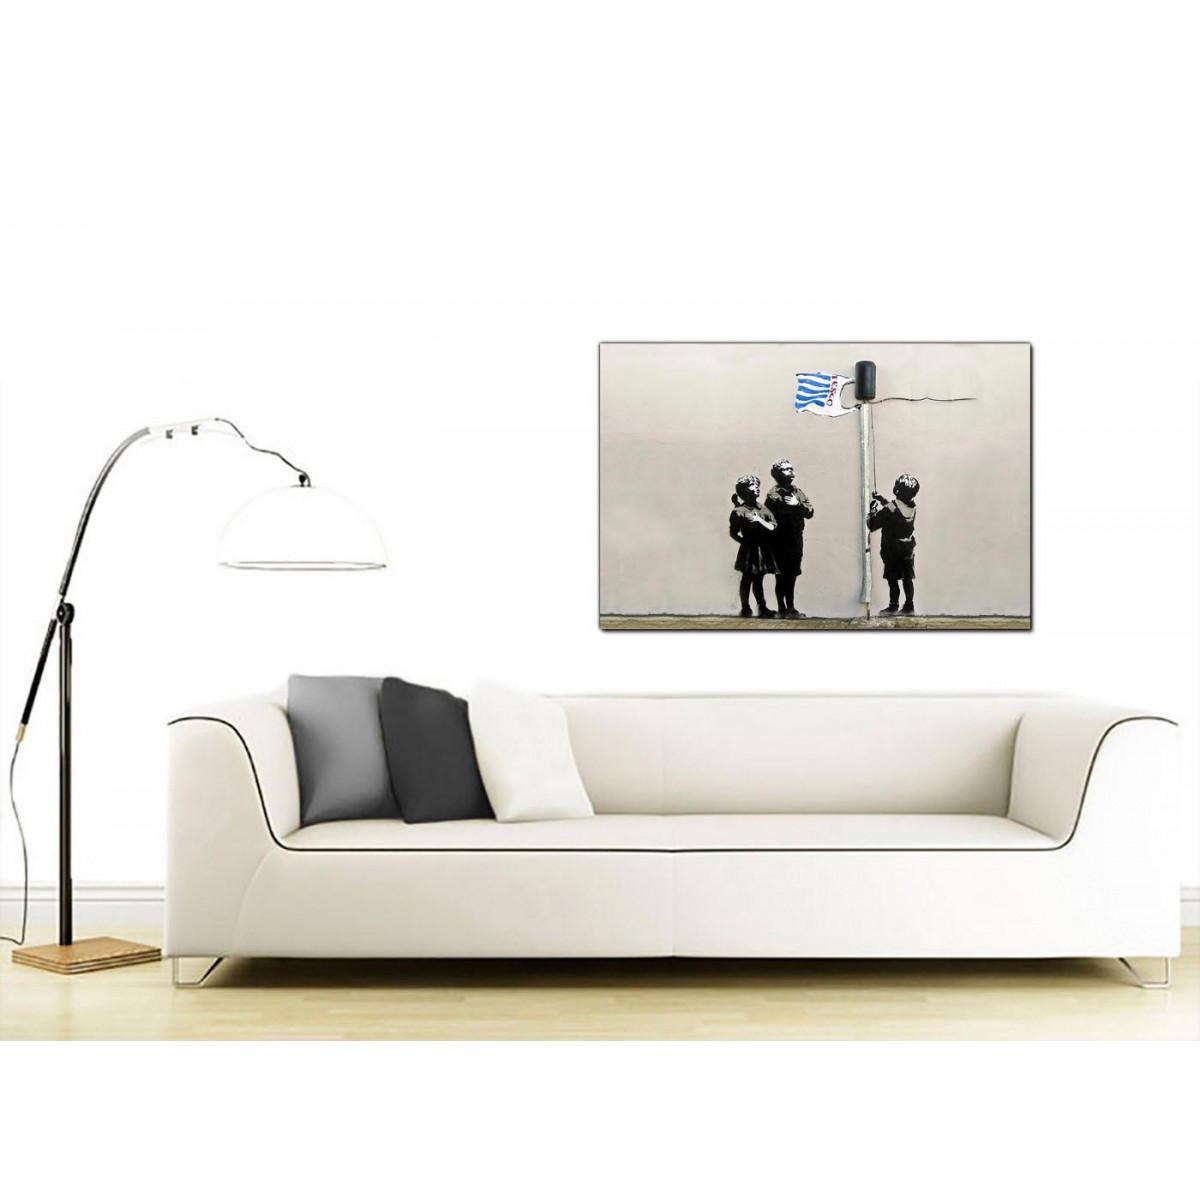 Tesco Living Room Furniture Banksy Canvas Prints Tesco Generation Very Little Helps